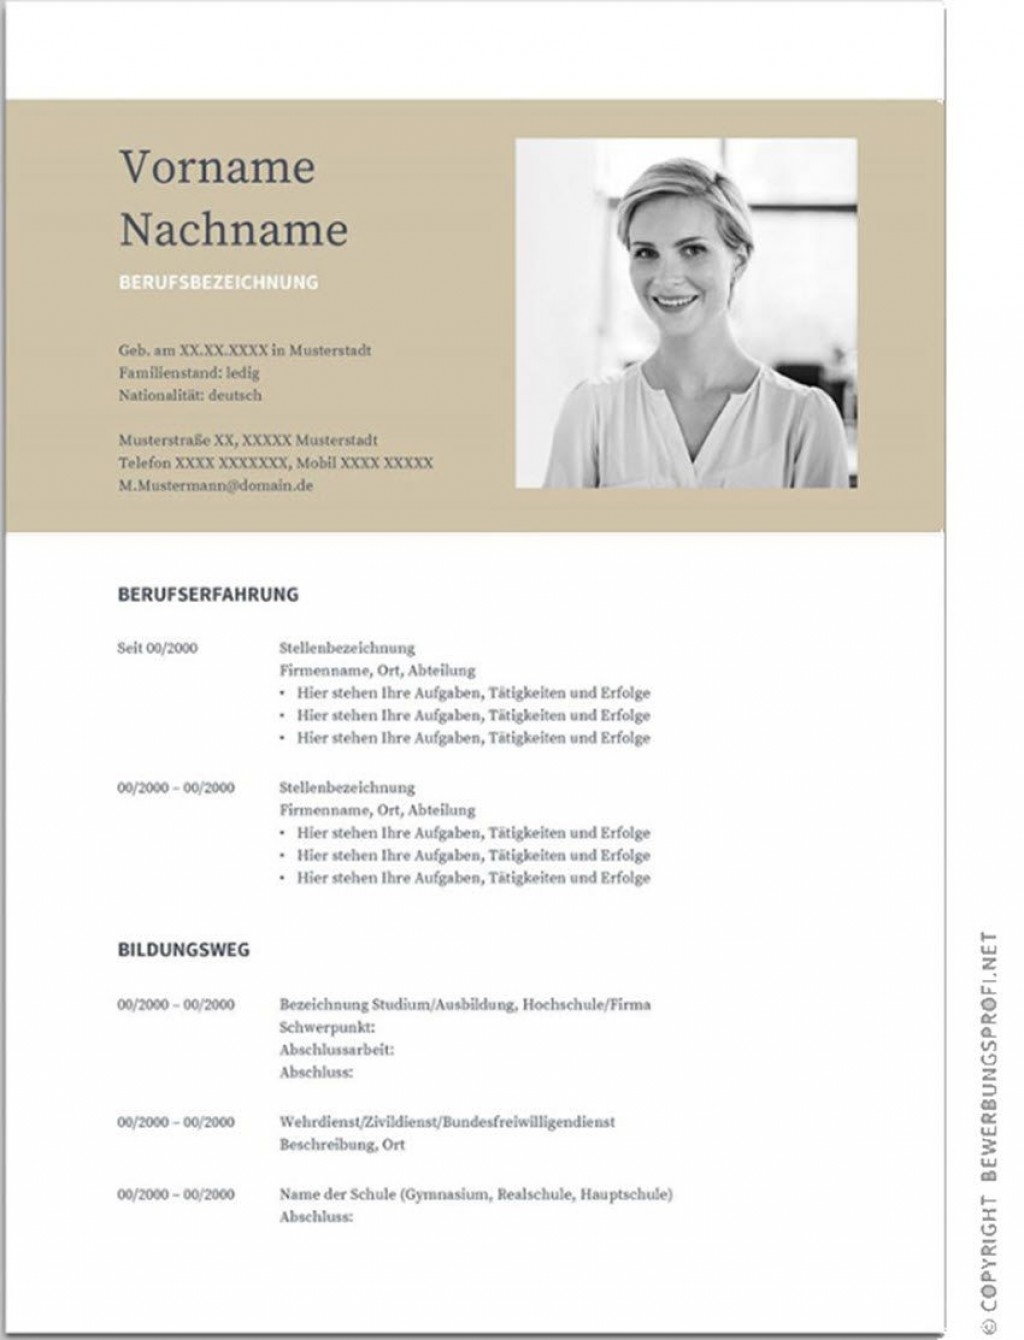 009 Stirring Brochure Template For Google Doc Inspiration  Docs Free 3 Panel Tri FoldLarge